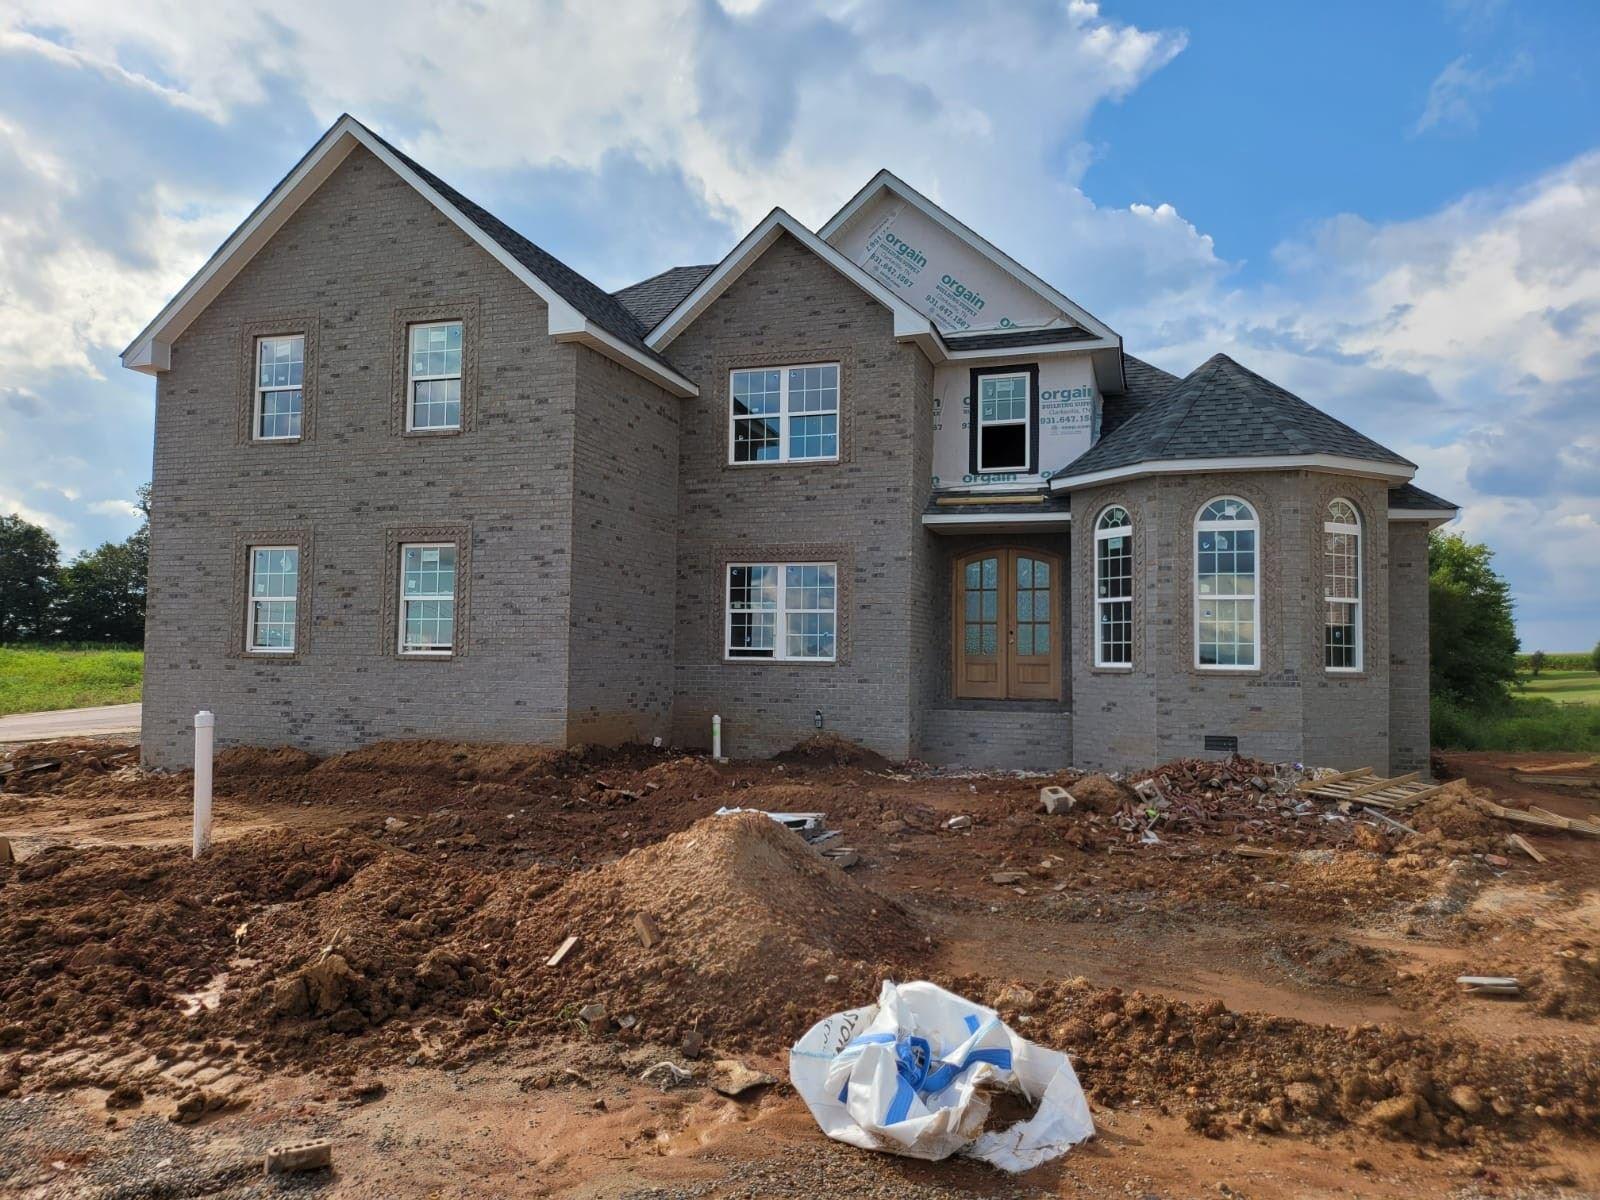 124 Hartley Hills, Clarksville, TN 37043 - MLS#: 2233949